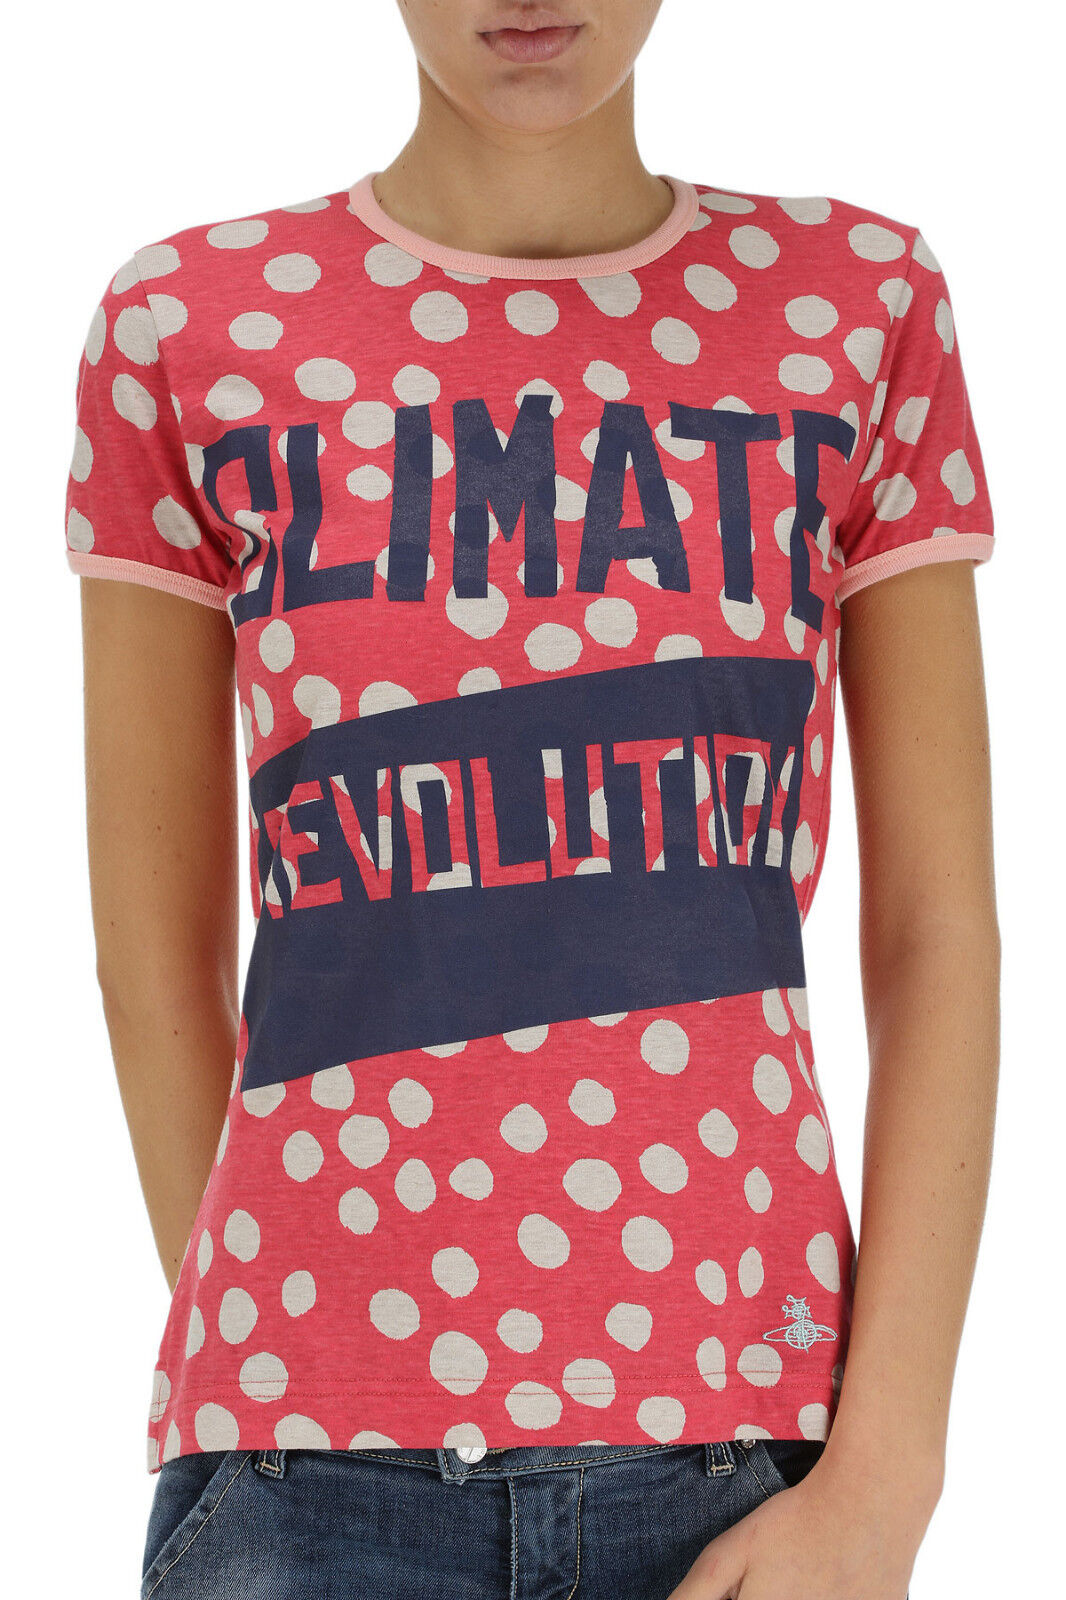 Vivienne Westwood t-shirt climate, Climate tshirt short sleeves Größe S